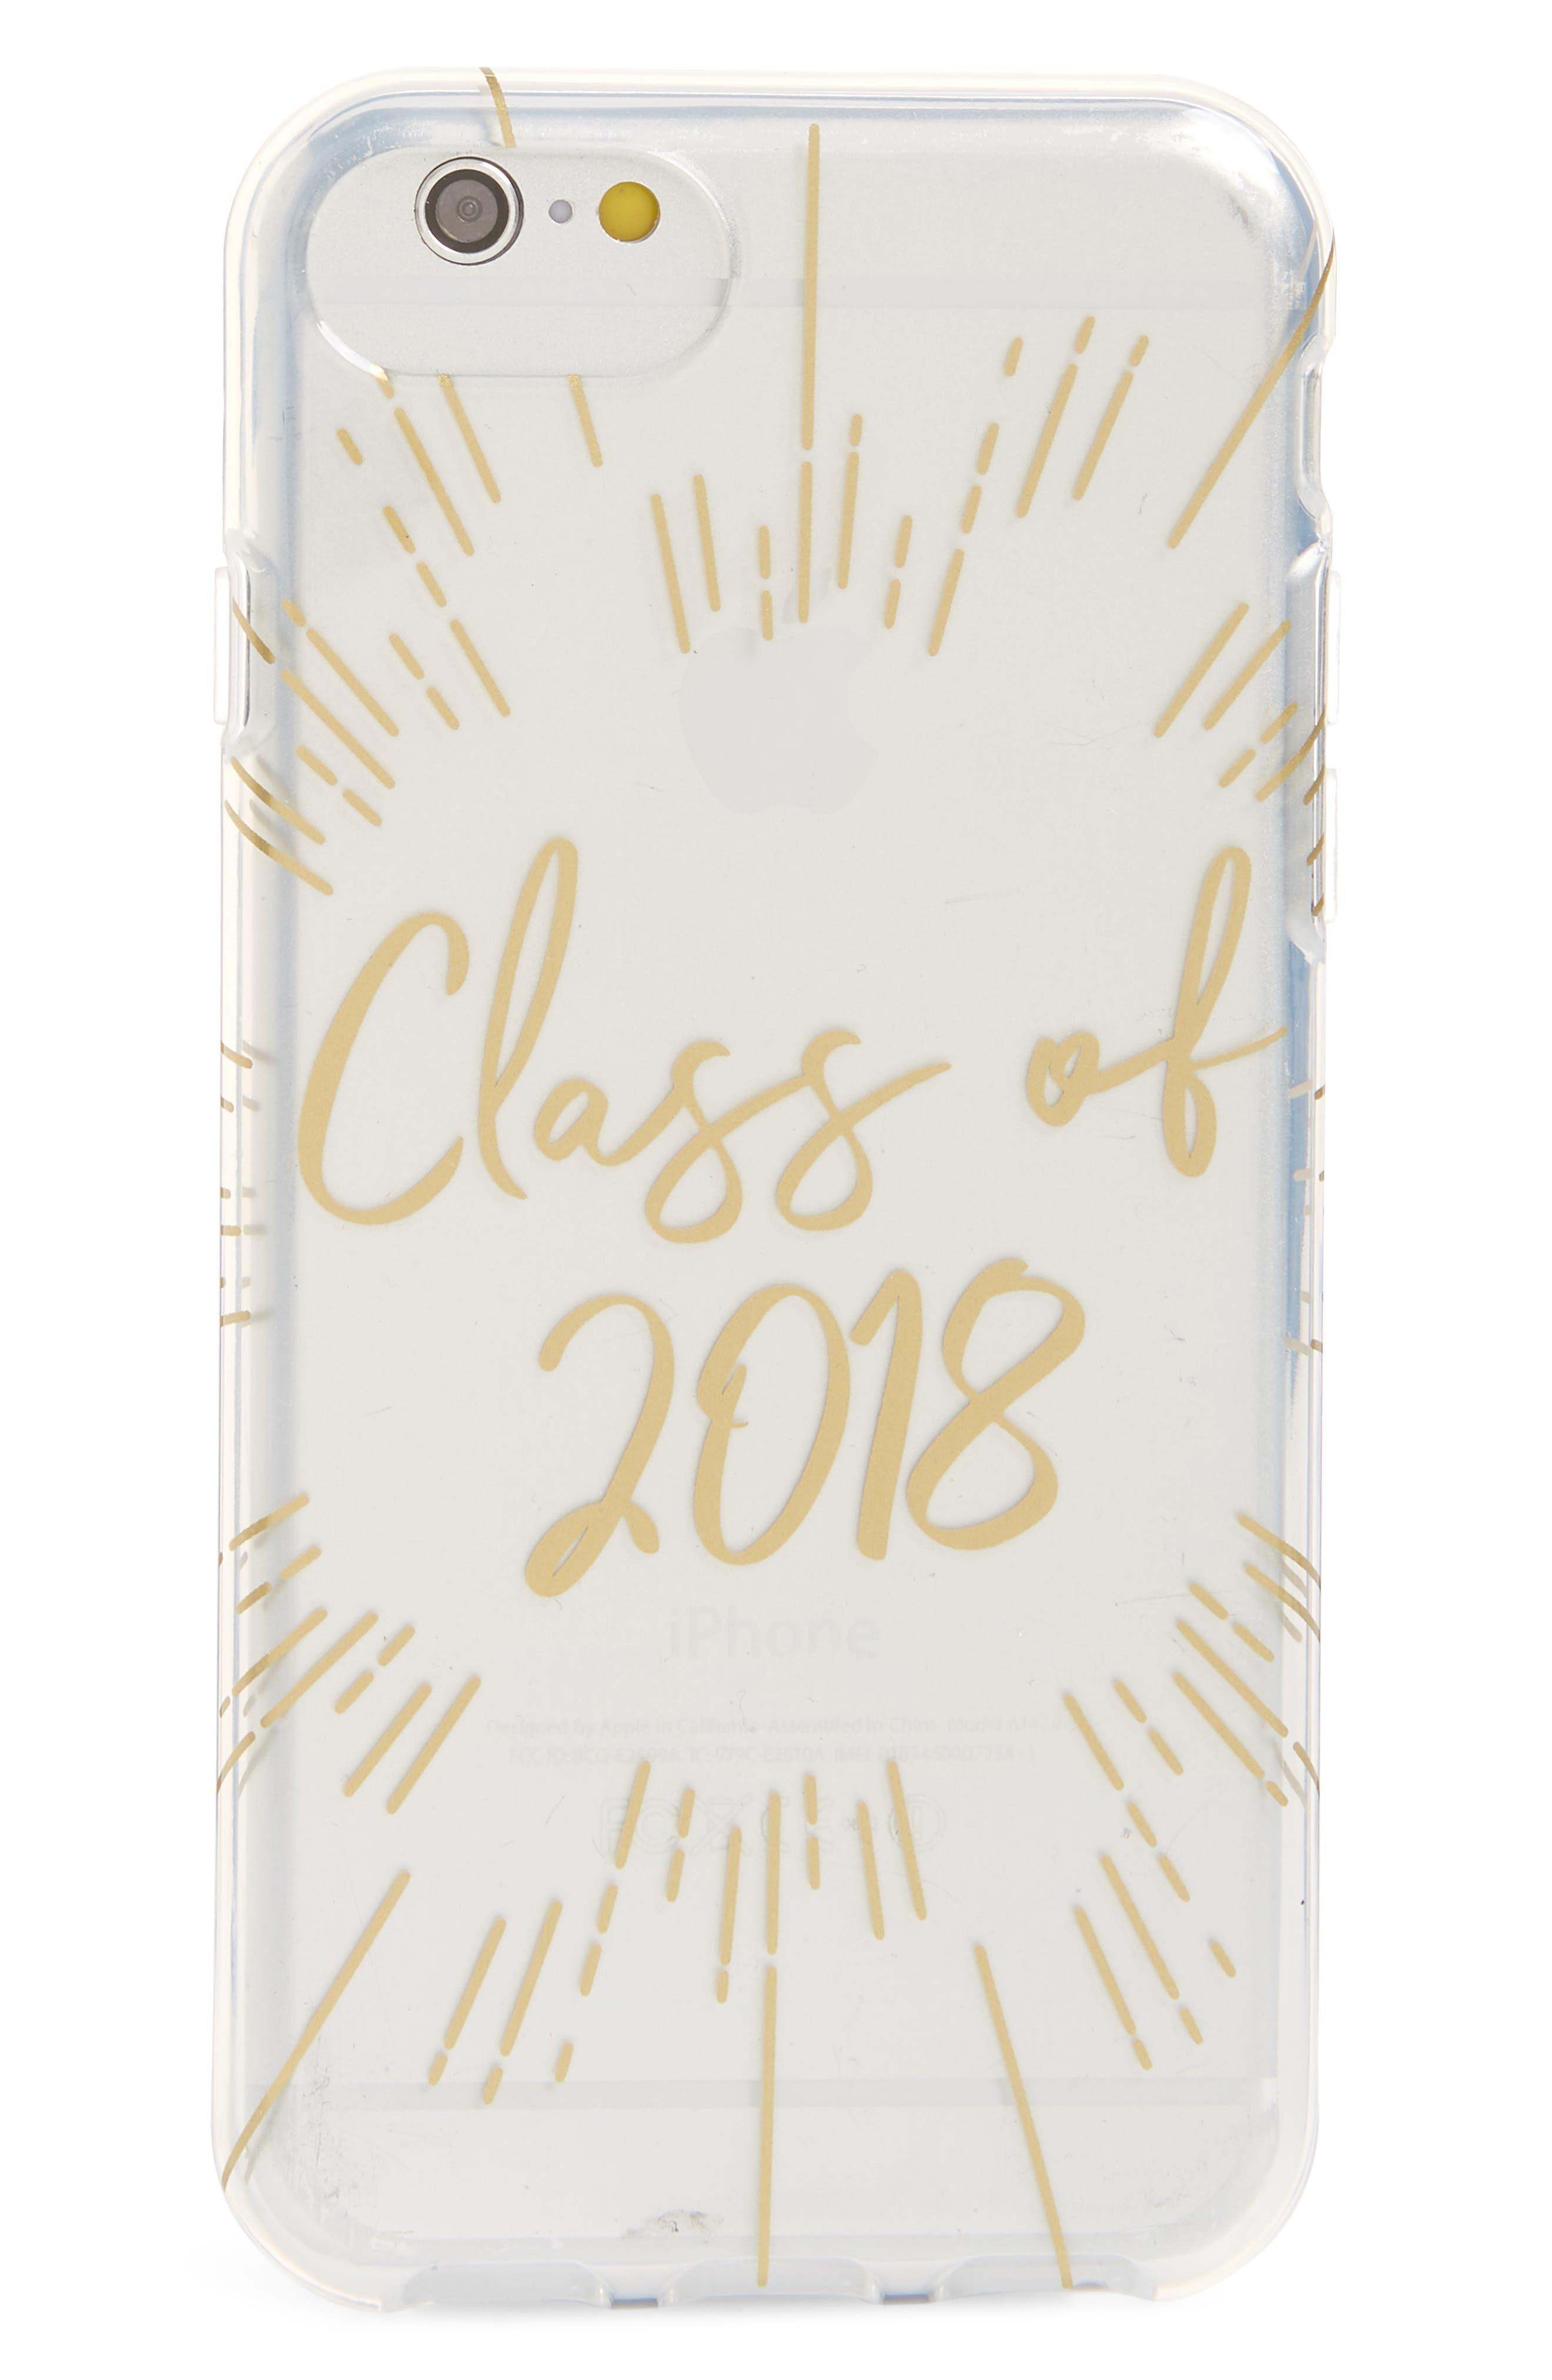 Class of 2018 iPhone 7/8 & 7/8 Plus Case,                         Main,                         color, Miscellaneous